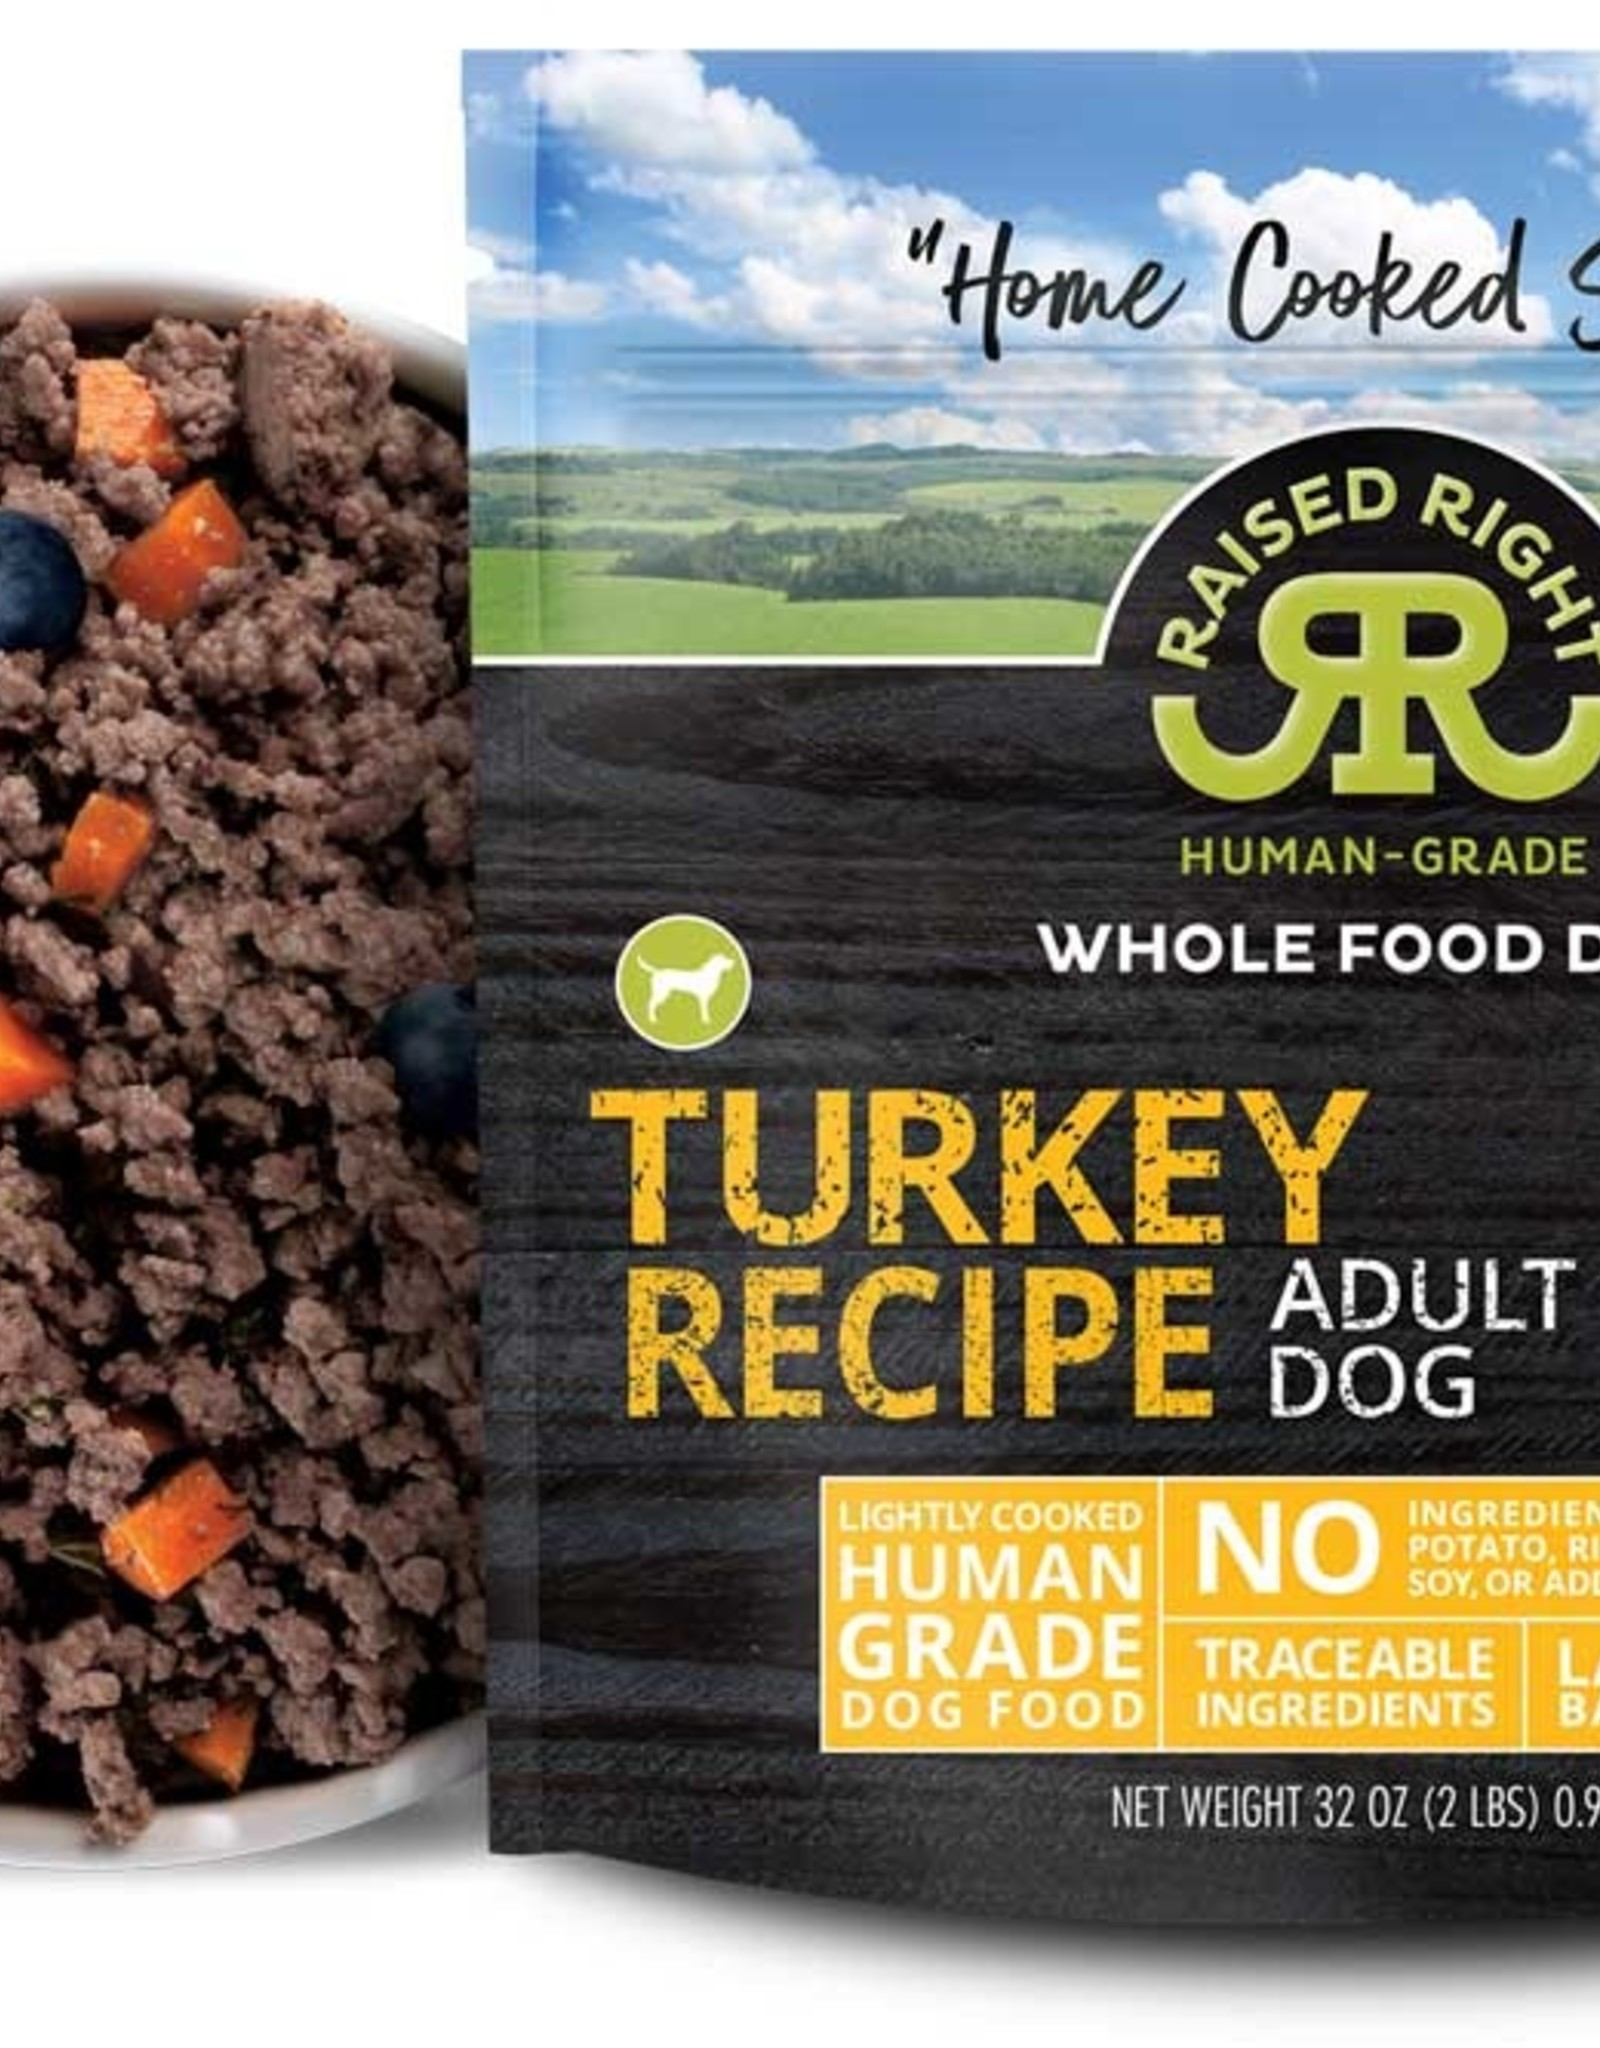 Raised Right Raised Right Turkey Adult Dog Recipe